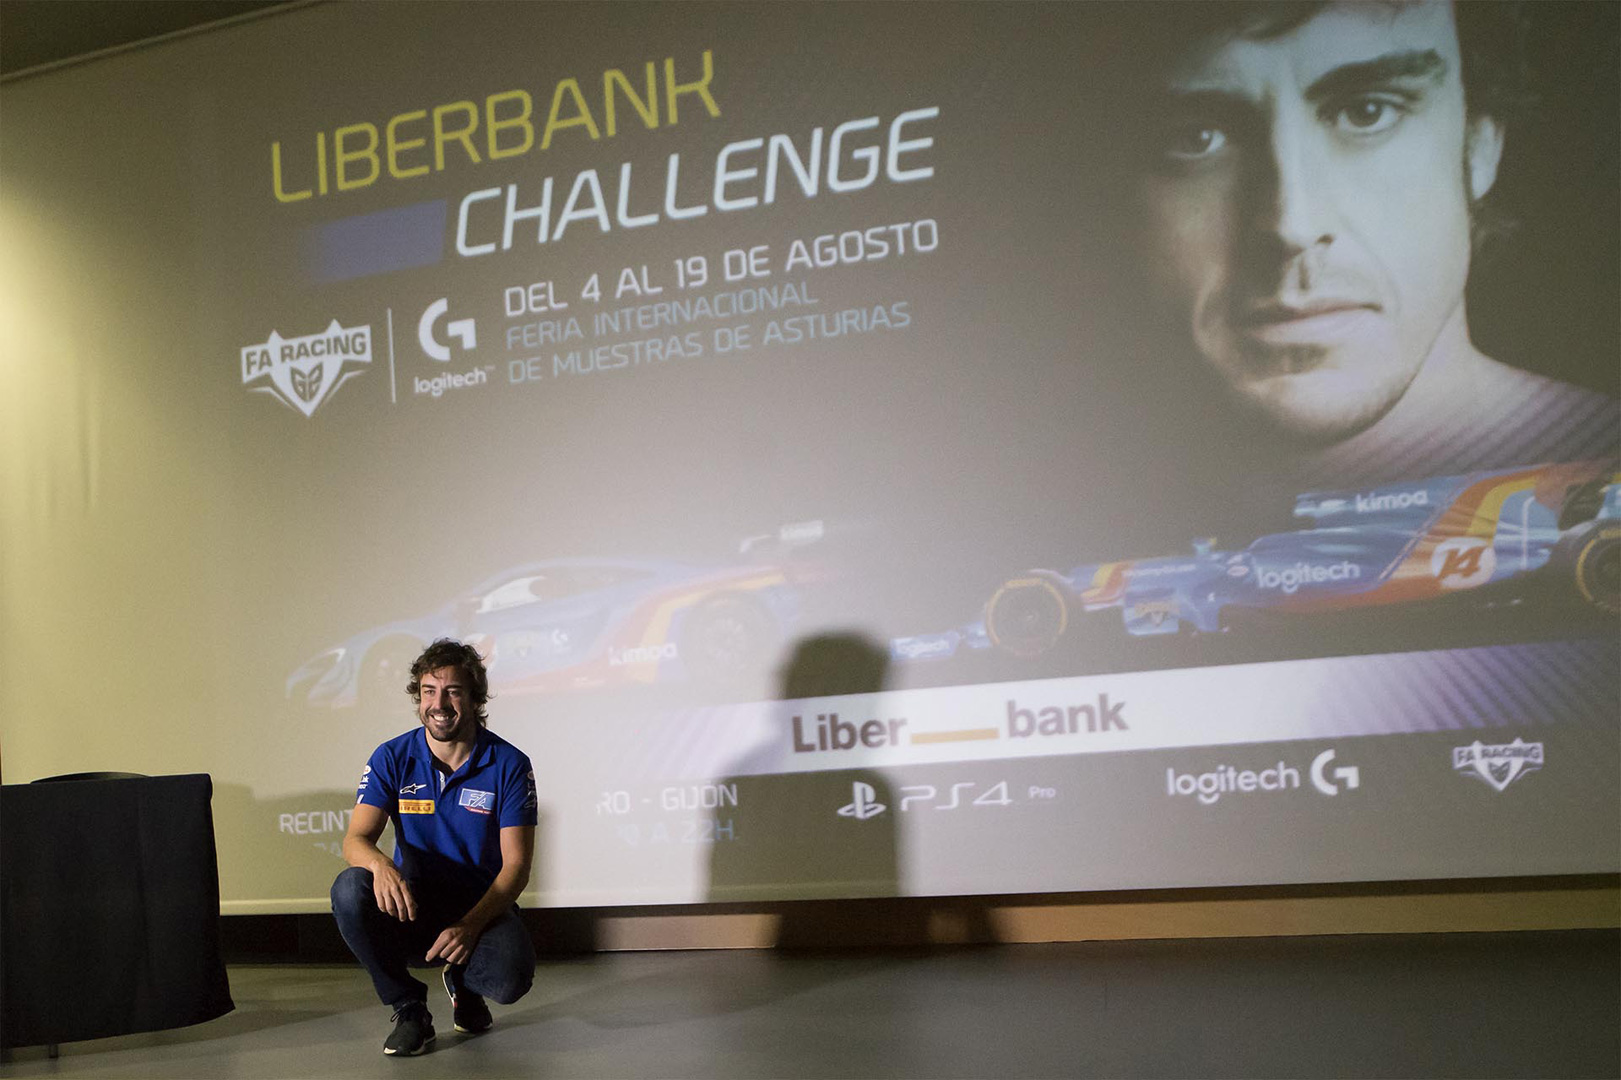 http://www.idgtv.es/archivos/201807/fernando-alonso-liberbank-challenge-img3.jpg